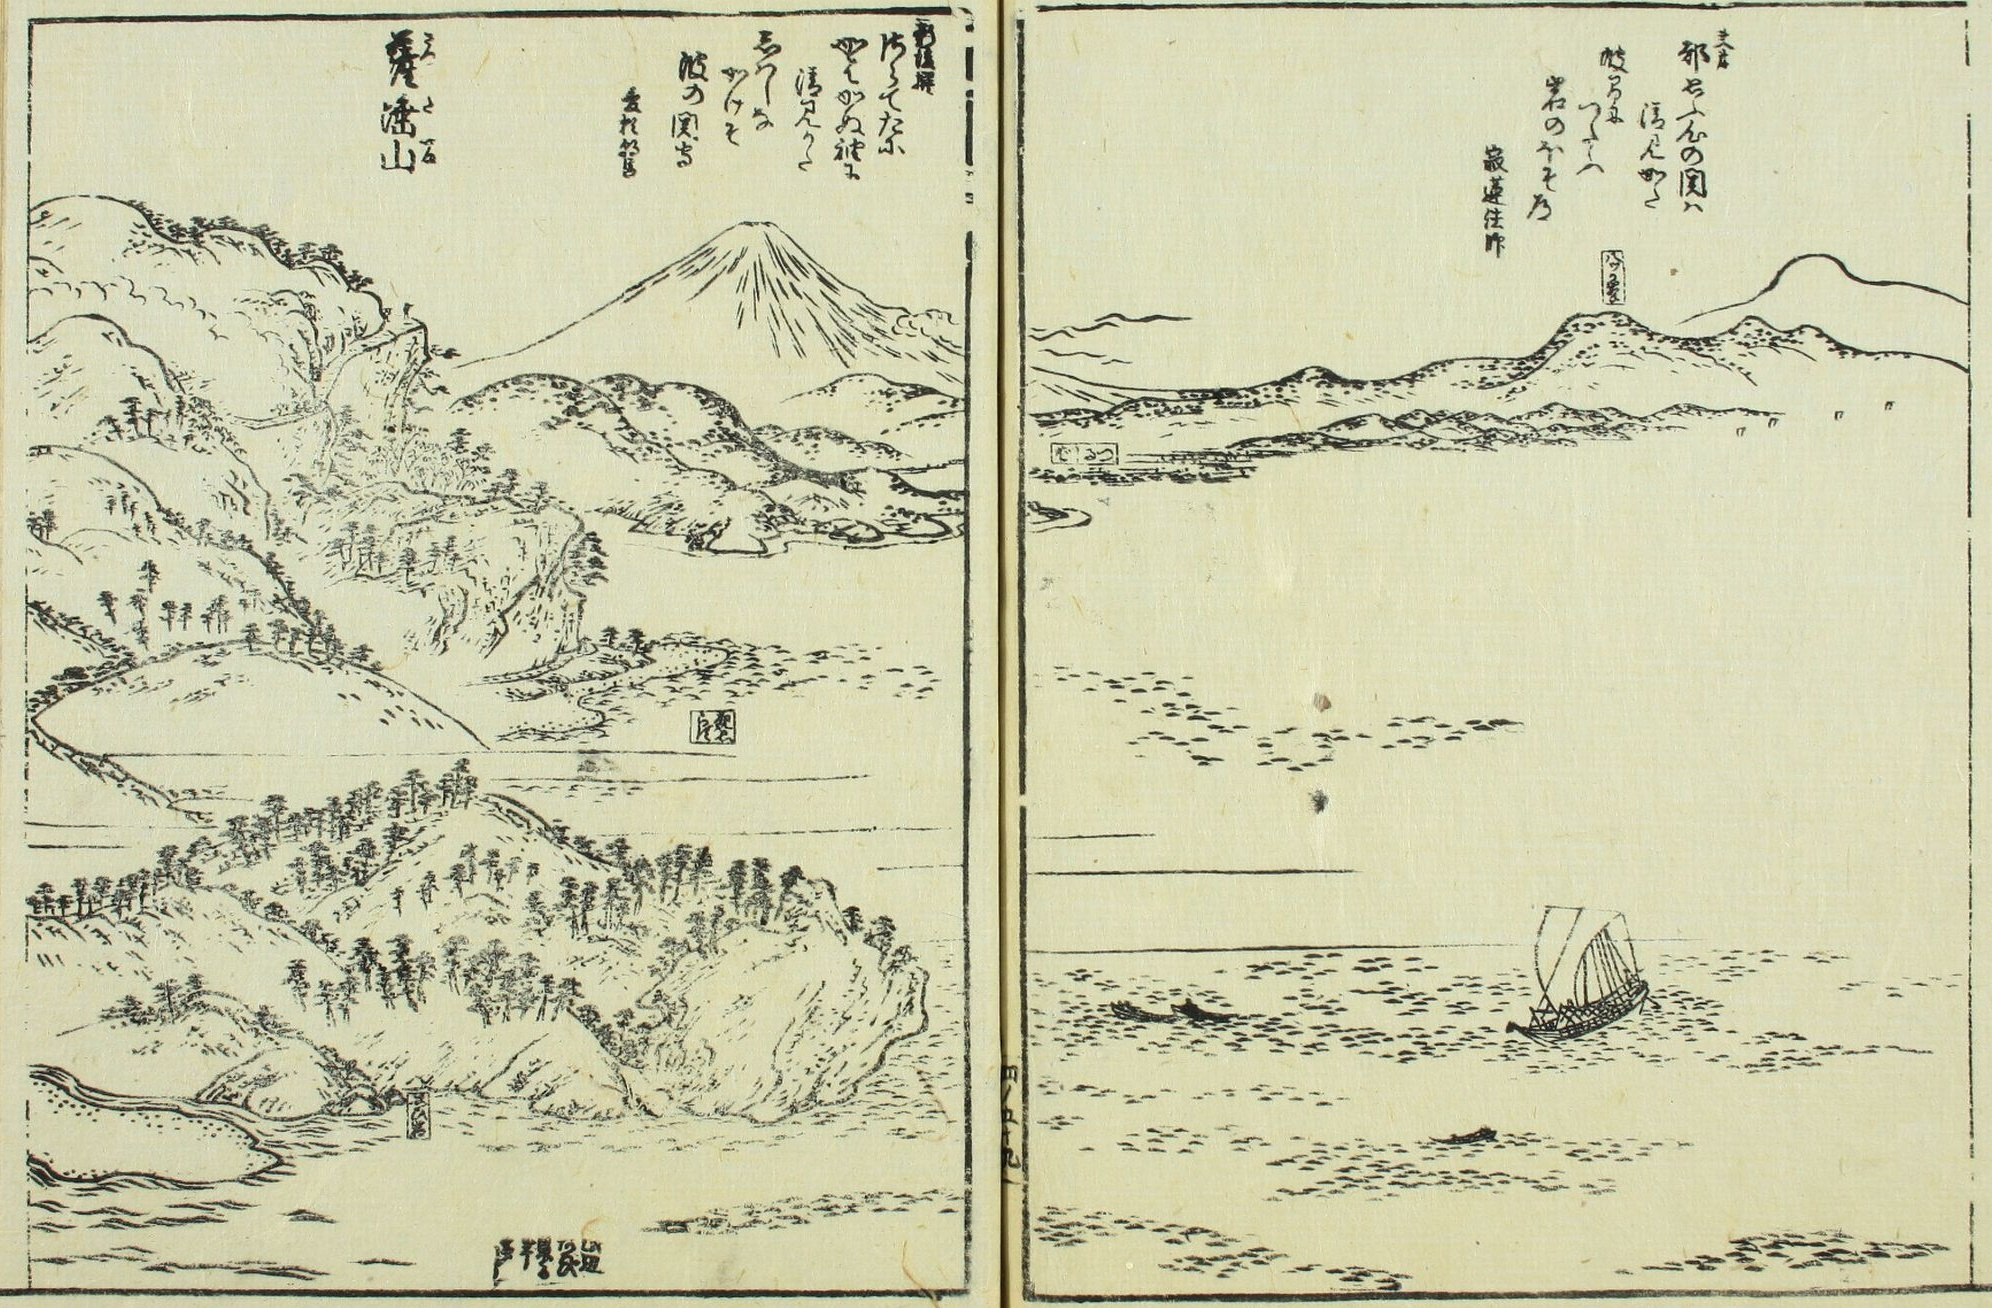 File:Hiroshige-53-Stations-Hoeido-template-Tokaido-meisho-zue-vl-4 ...